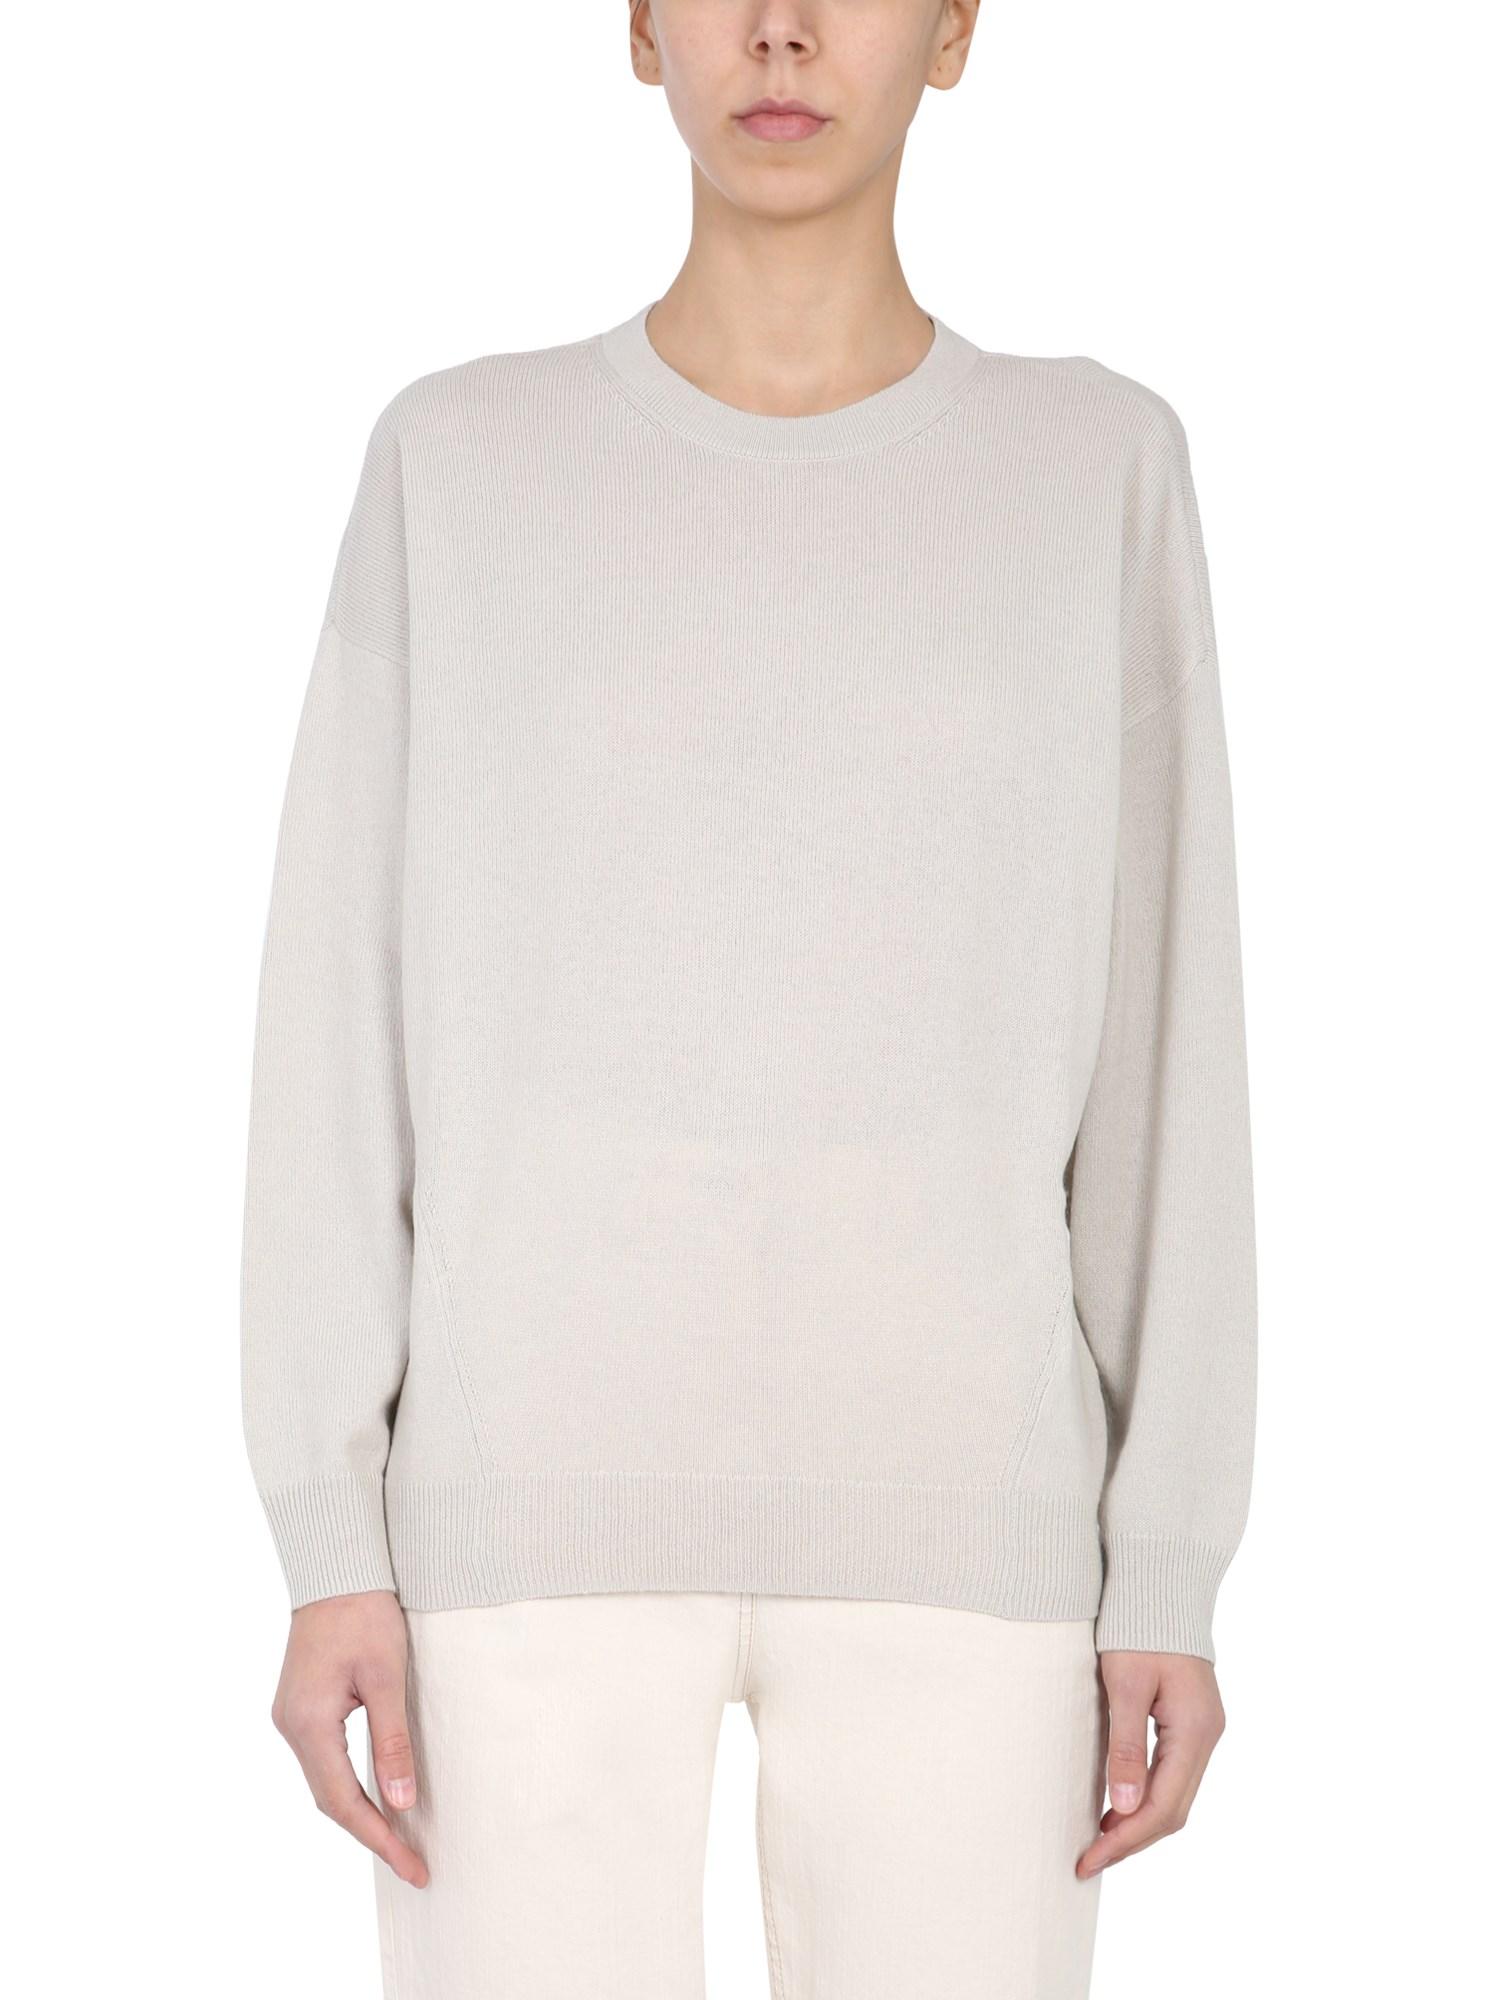 Iro oversize fit sweater - iro - Modalova